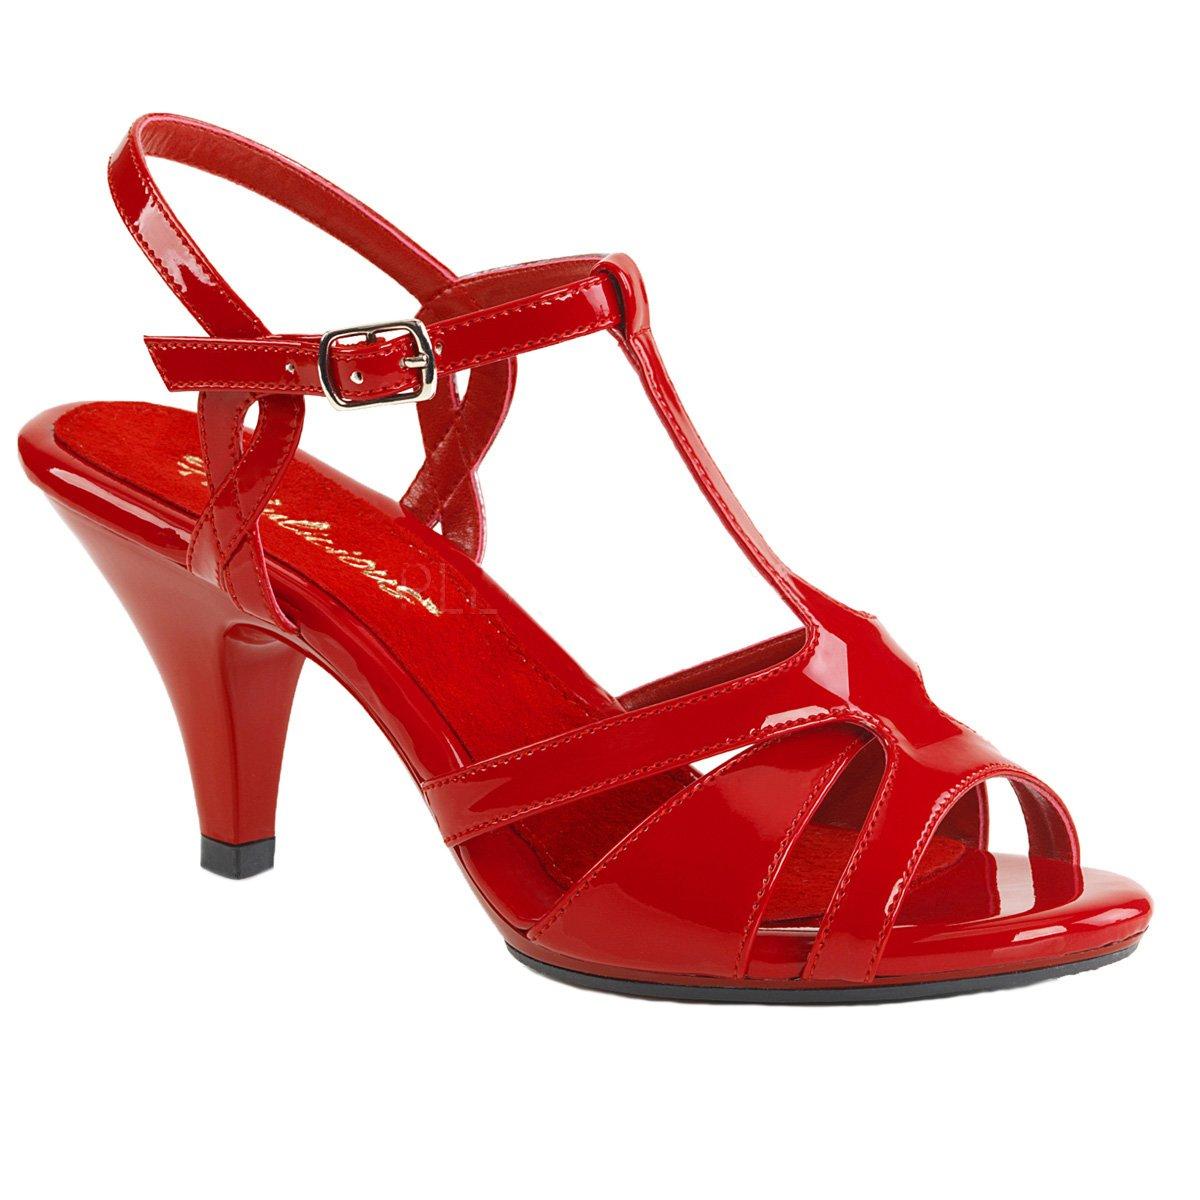 Fabulicious Damen Sandalen Lack Sandaletten Belle-322 Lack rot Lack Sandalen Rot 9179f3